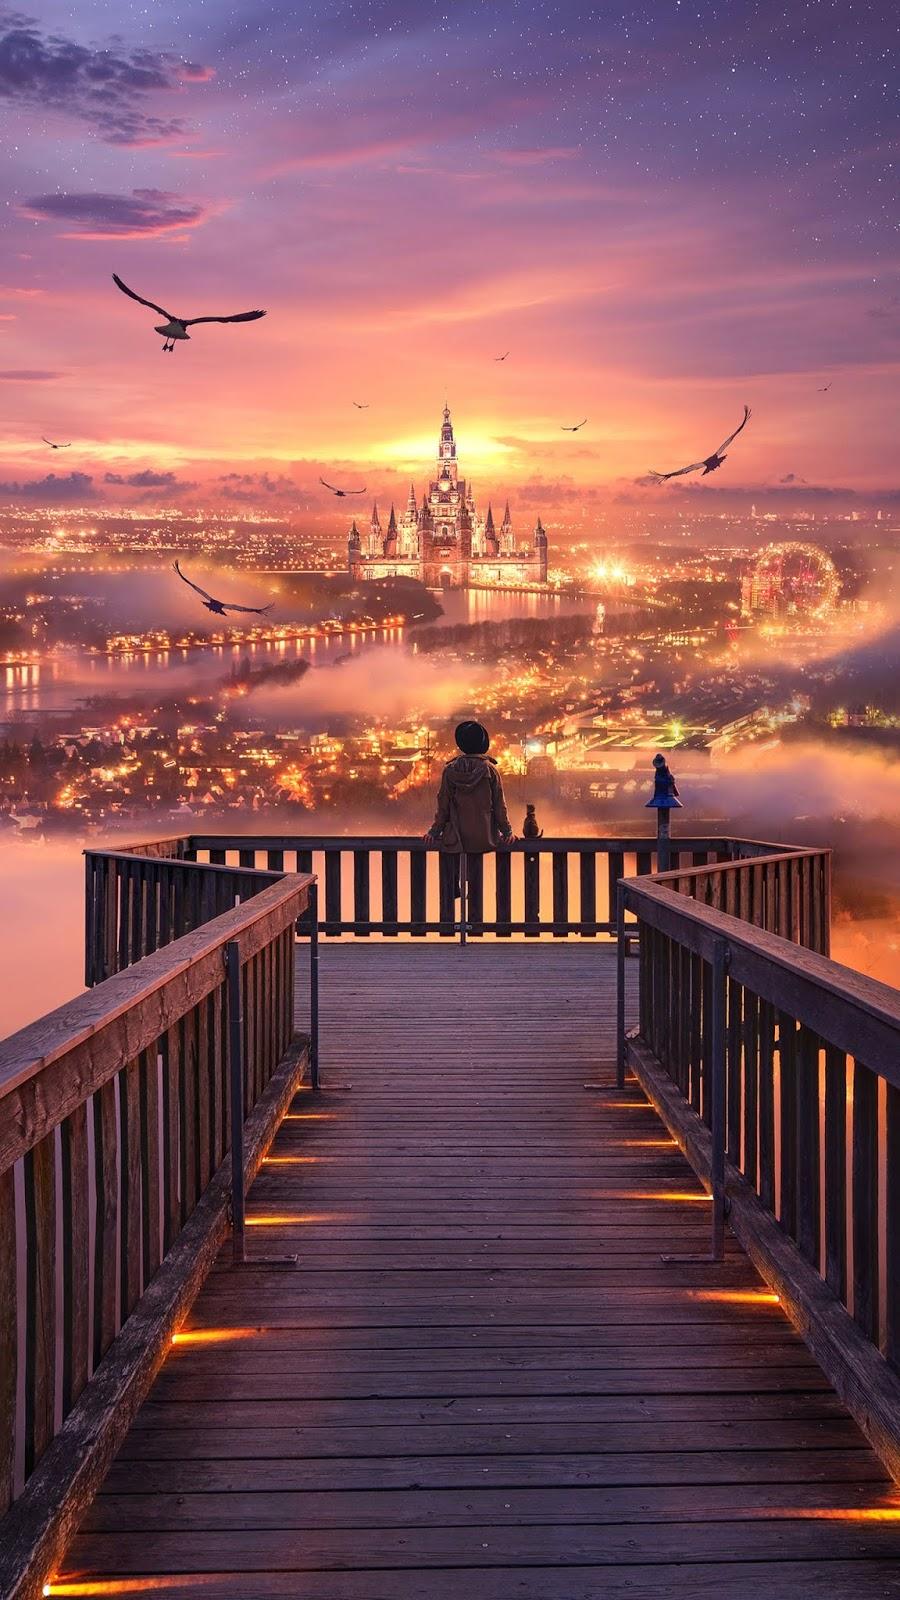 The city of dream